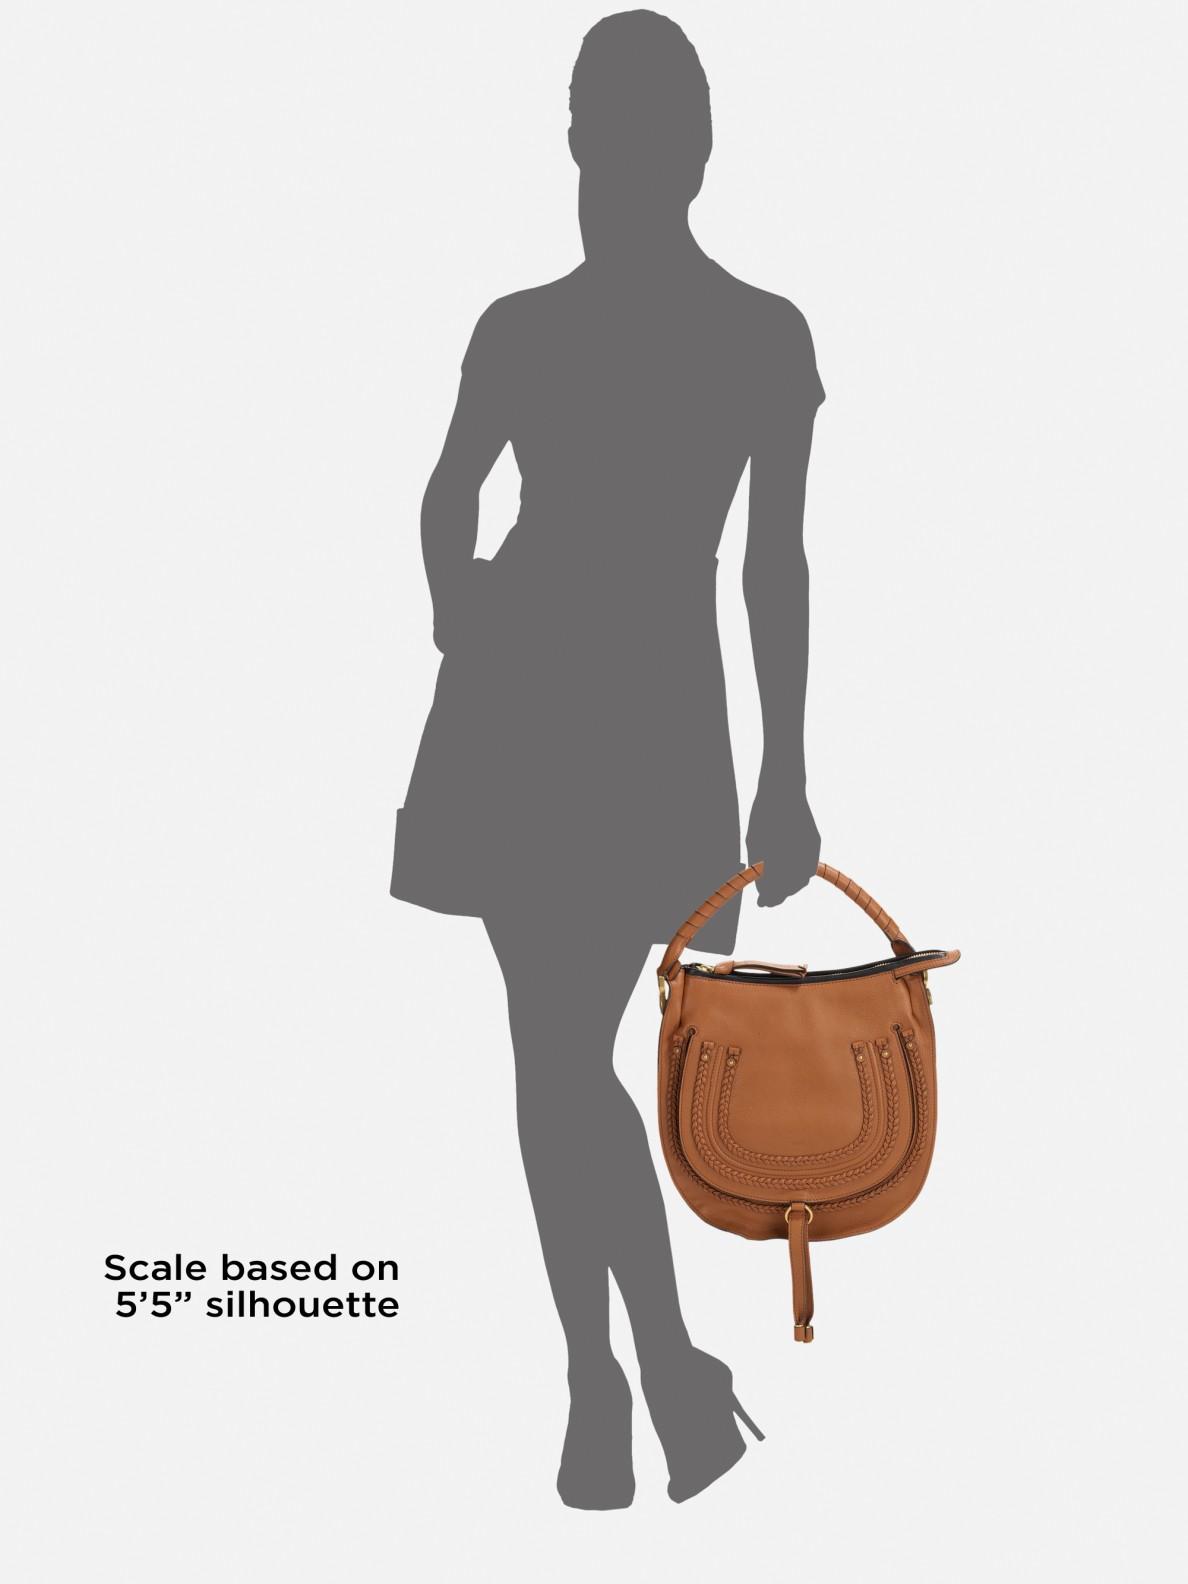 Lyst - Chloé Marcie Small Braided Hobo in Brown b4159c1176